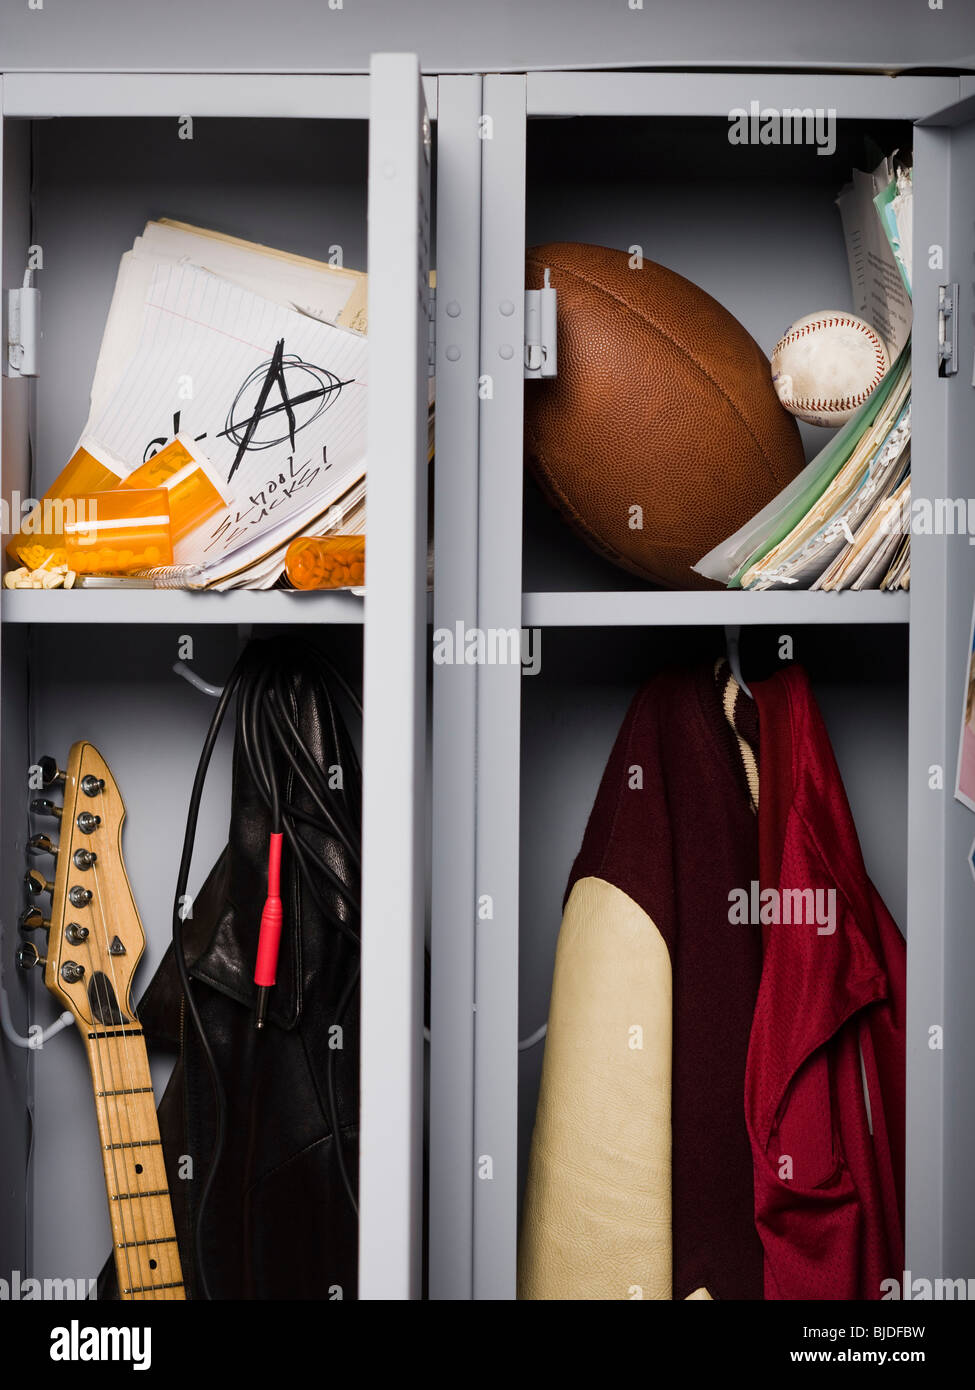 Contents of high school lockers. - Stock Image